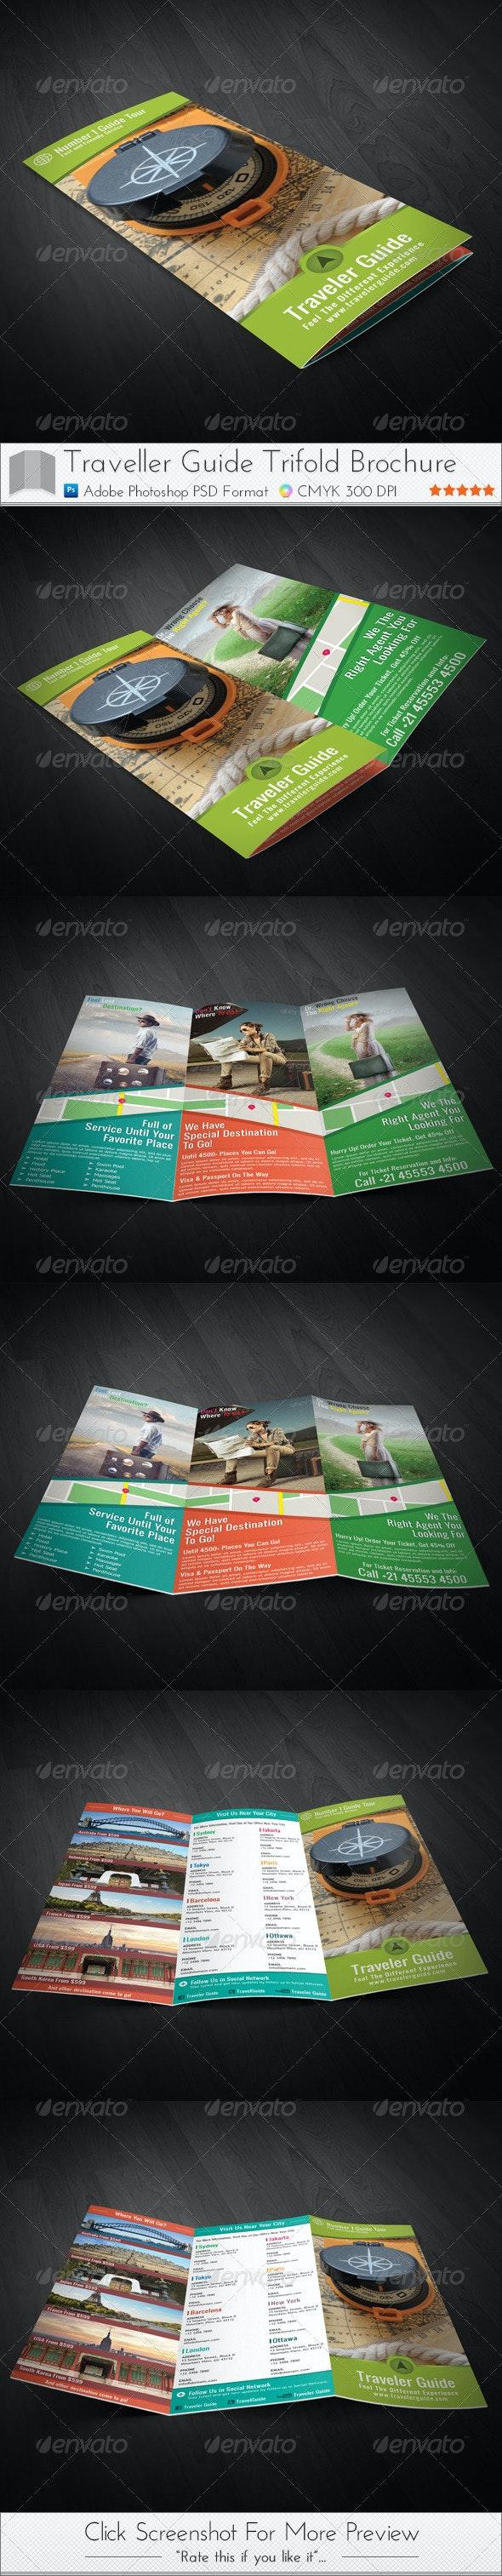 Traveler Guide Trifold Brochure - Brochures Print Templates